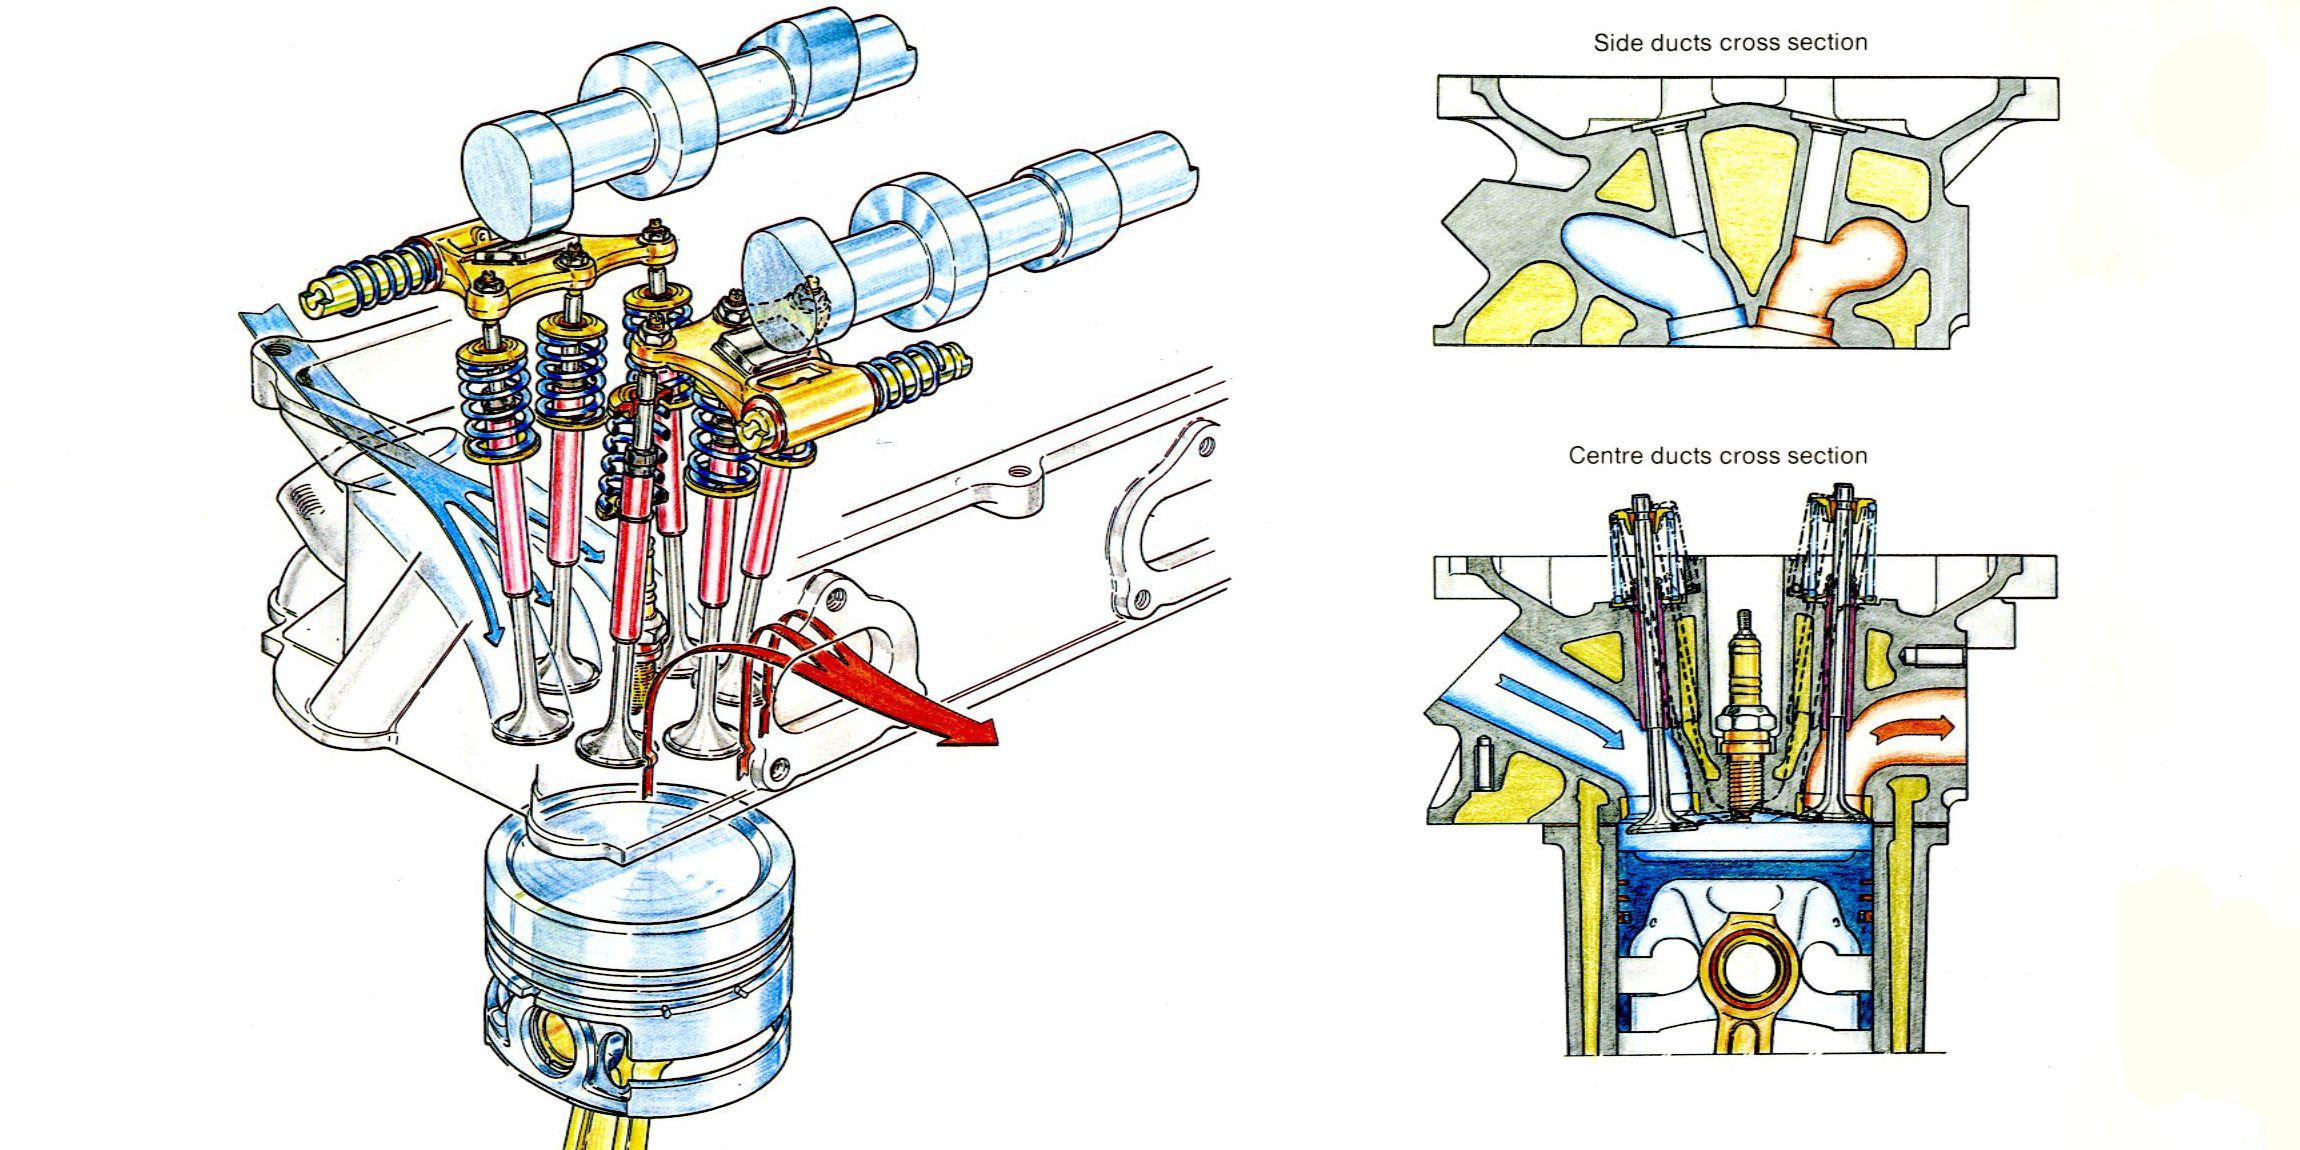 1984 maserati biturbo wiring diagram schematic diagrams rh ogmconsulting co